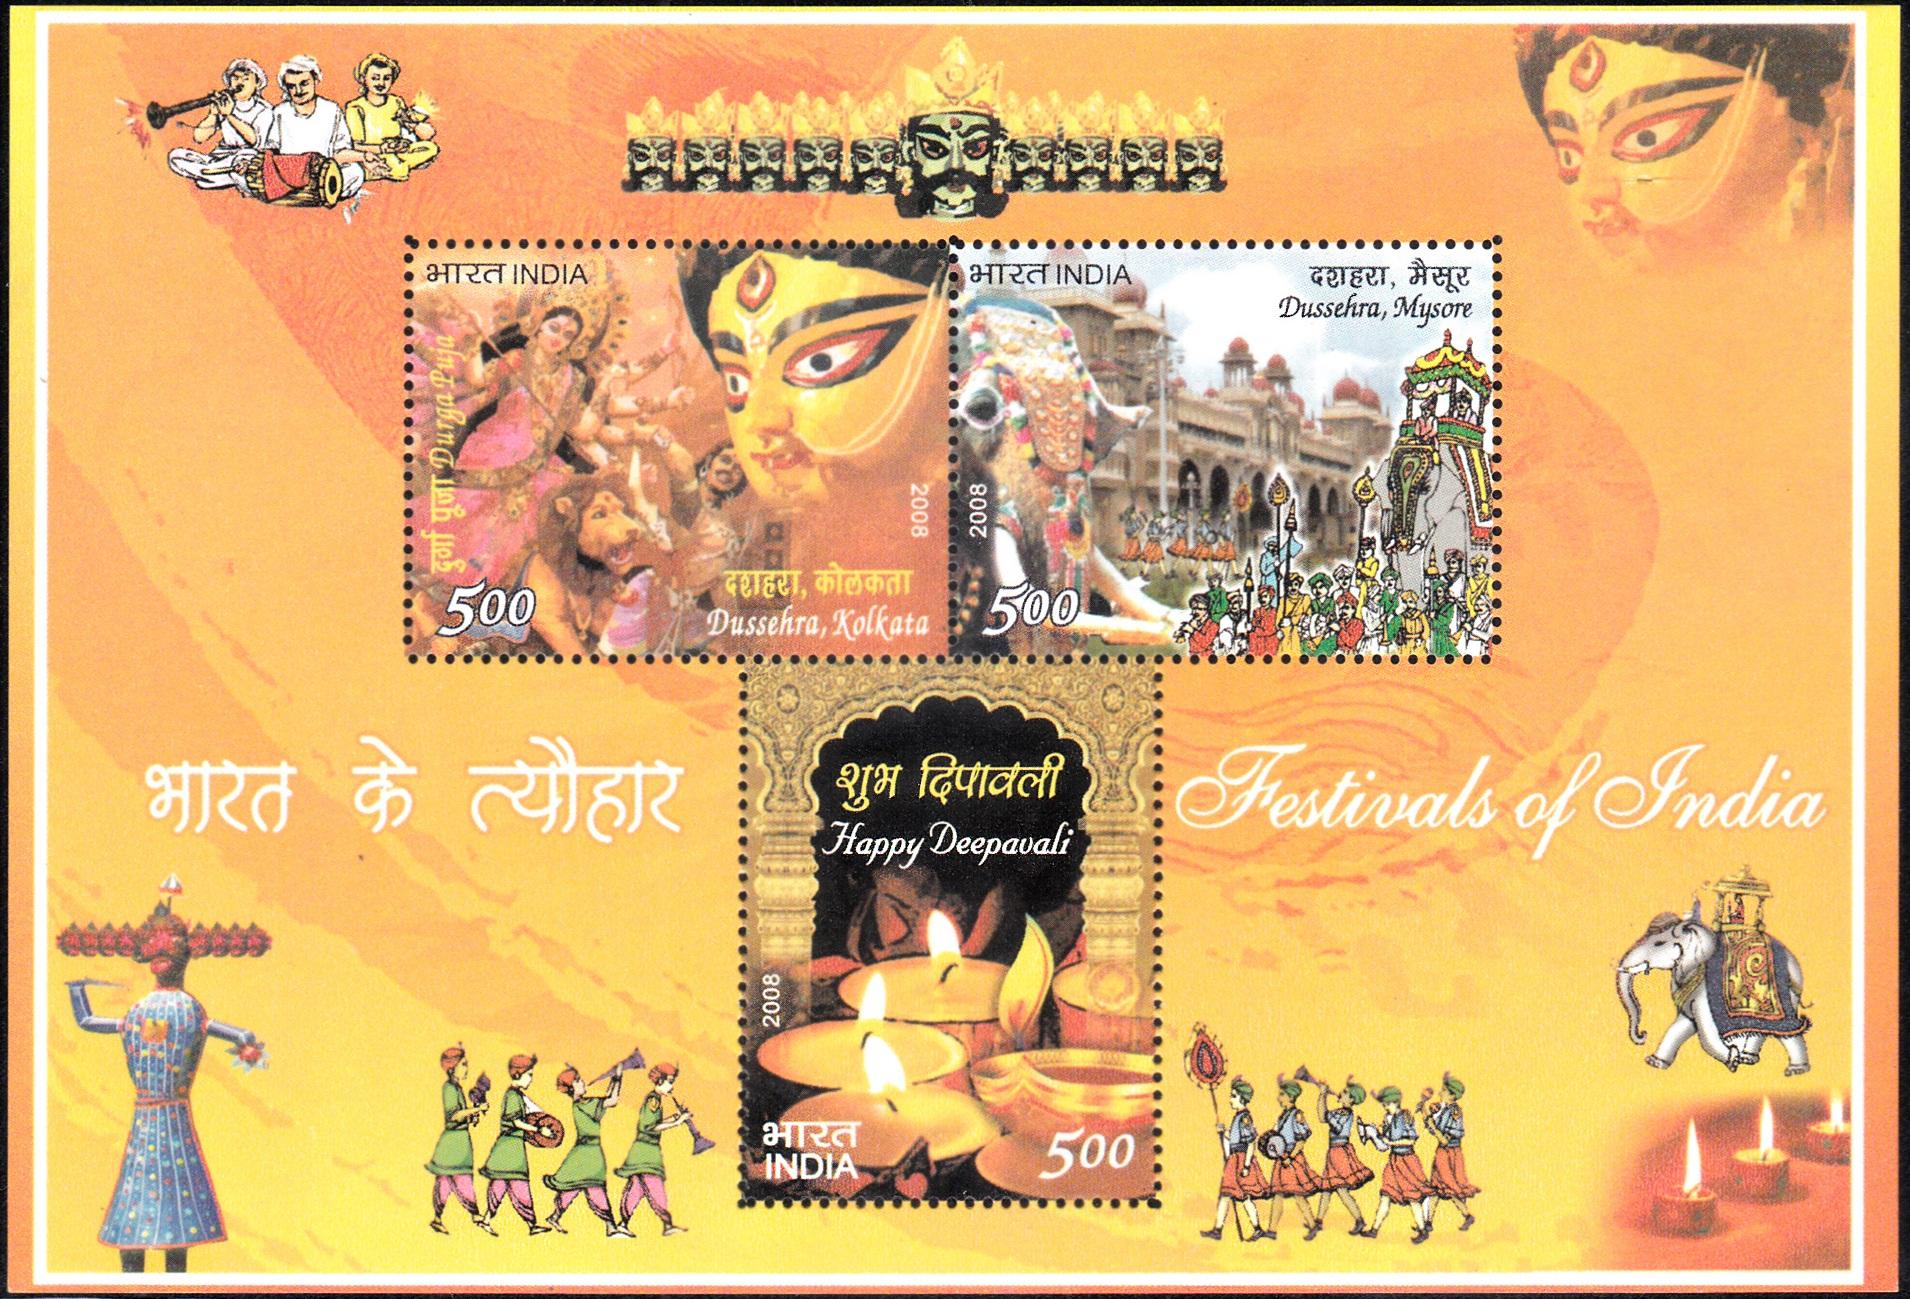 Durgotsava, Vijayadashami and Diwali